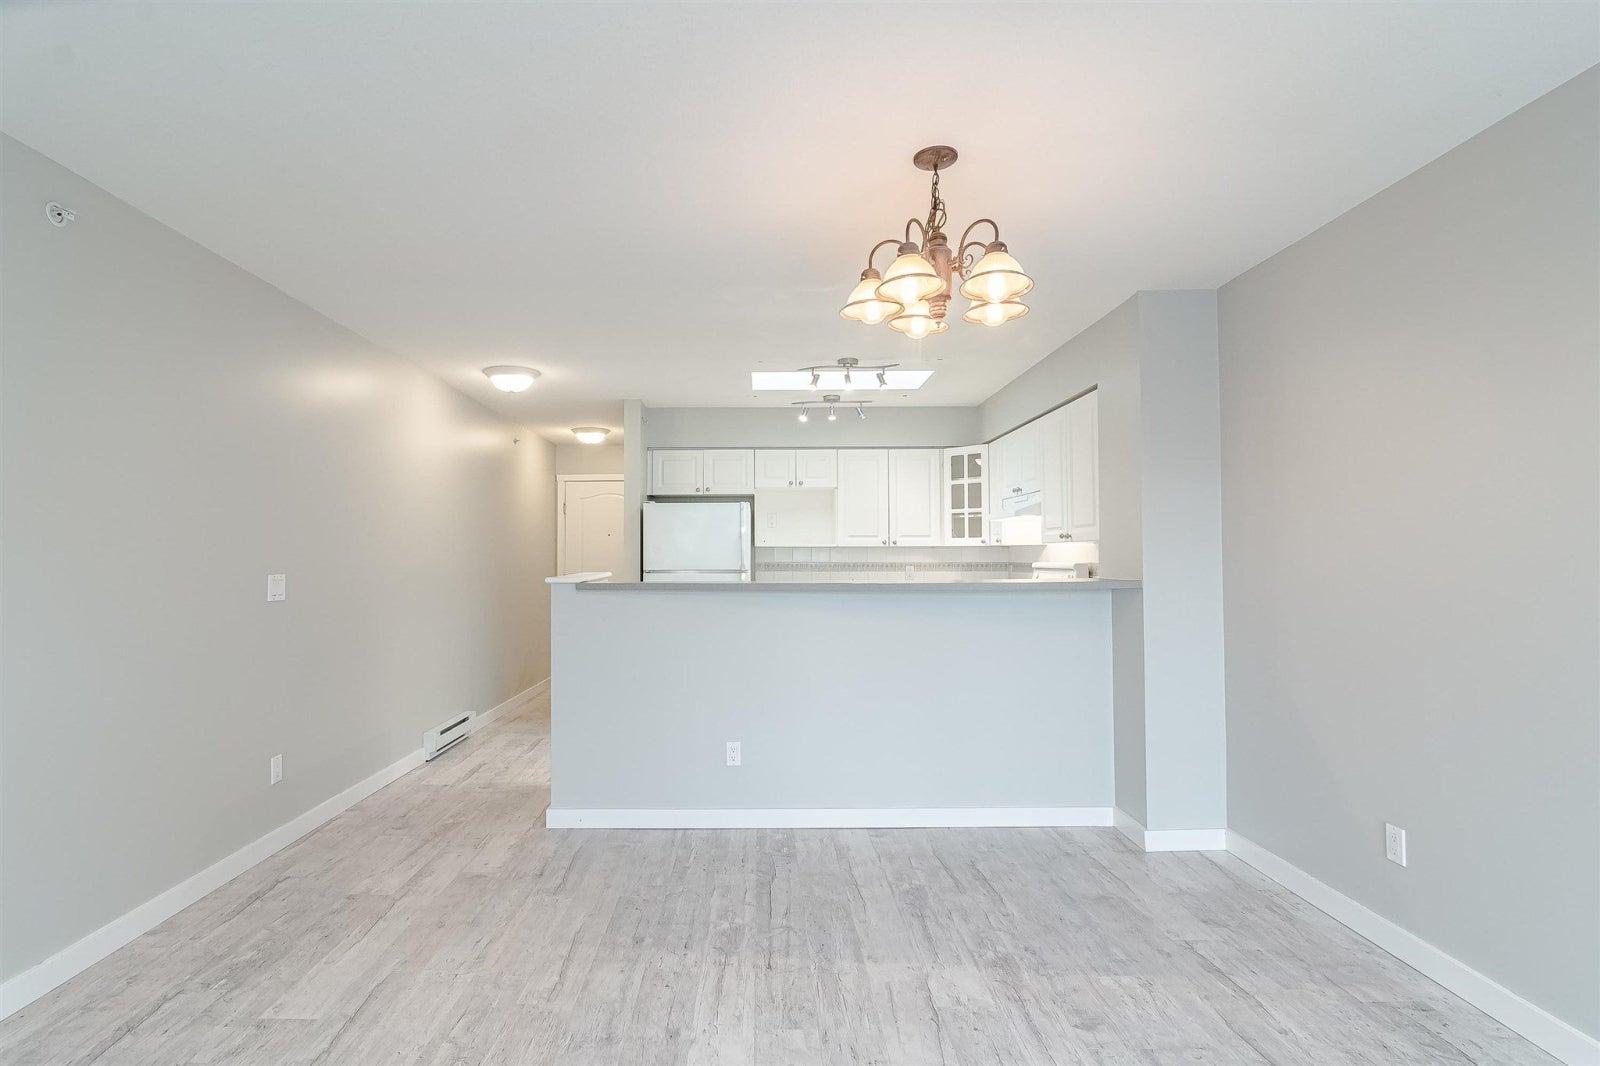 405 20268 54 AVENUE - Langley City Apartment/Condo for sale, 2 Bedrooms (R2604183) #4